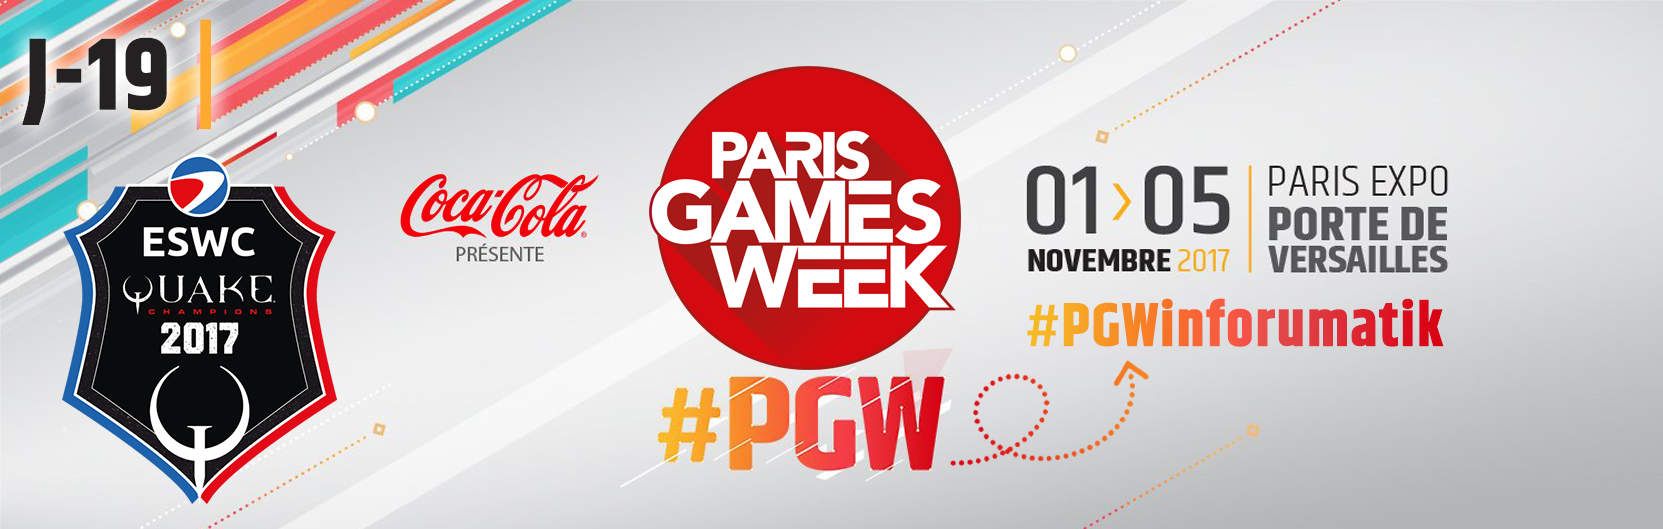 [J-19] Paris Games Week 2017 : ESWC Quake Champions 2017